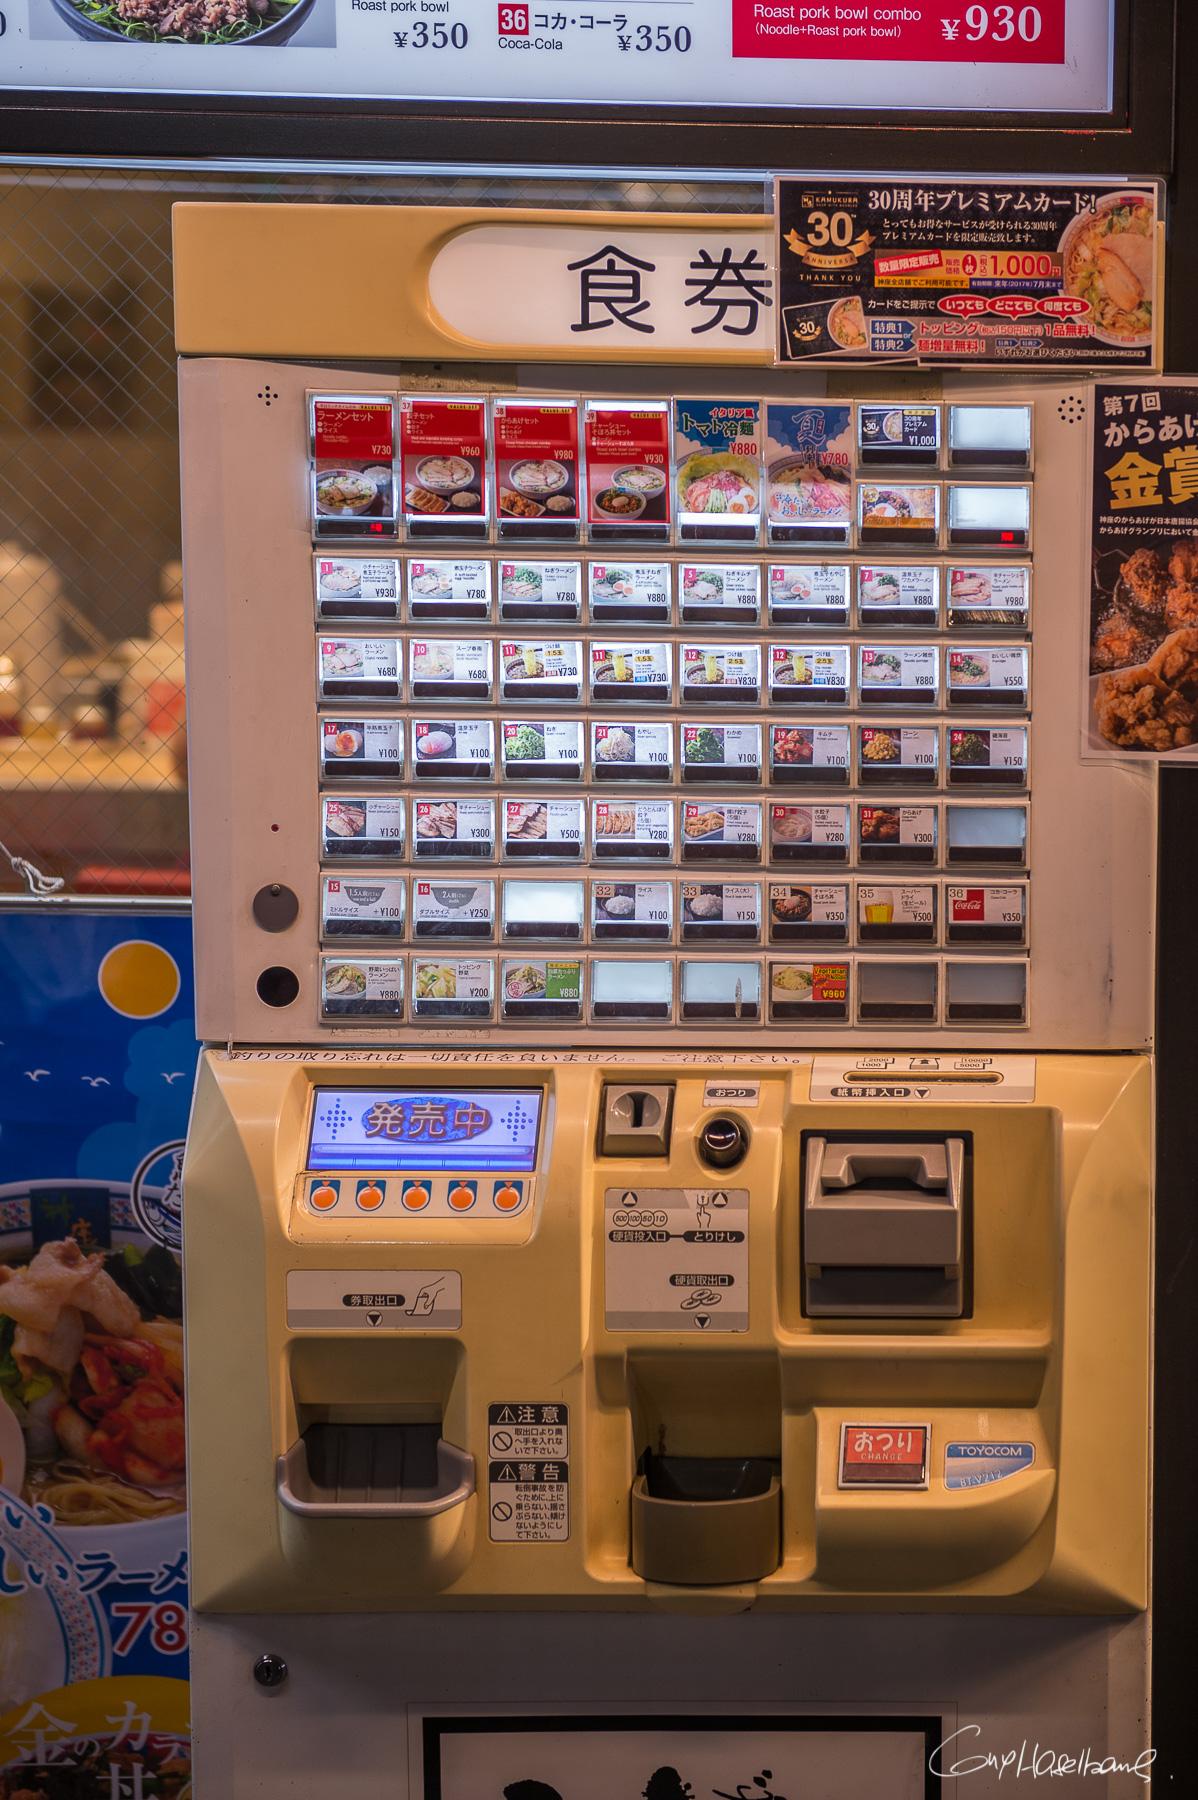 Automate de commande restaurant - Shibuya - Tokyo - Japon.